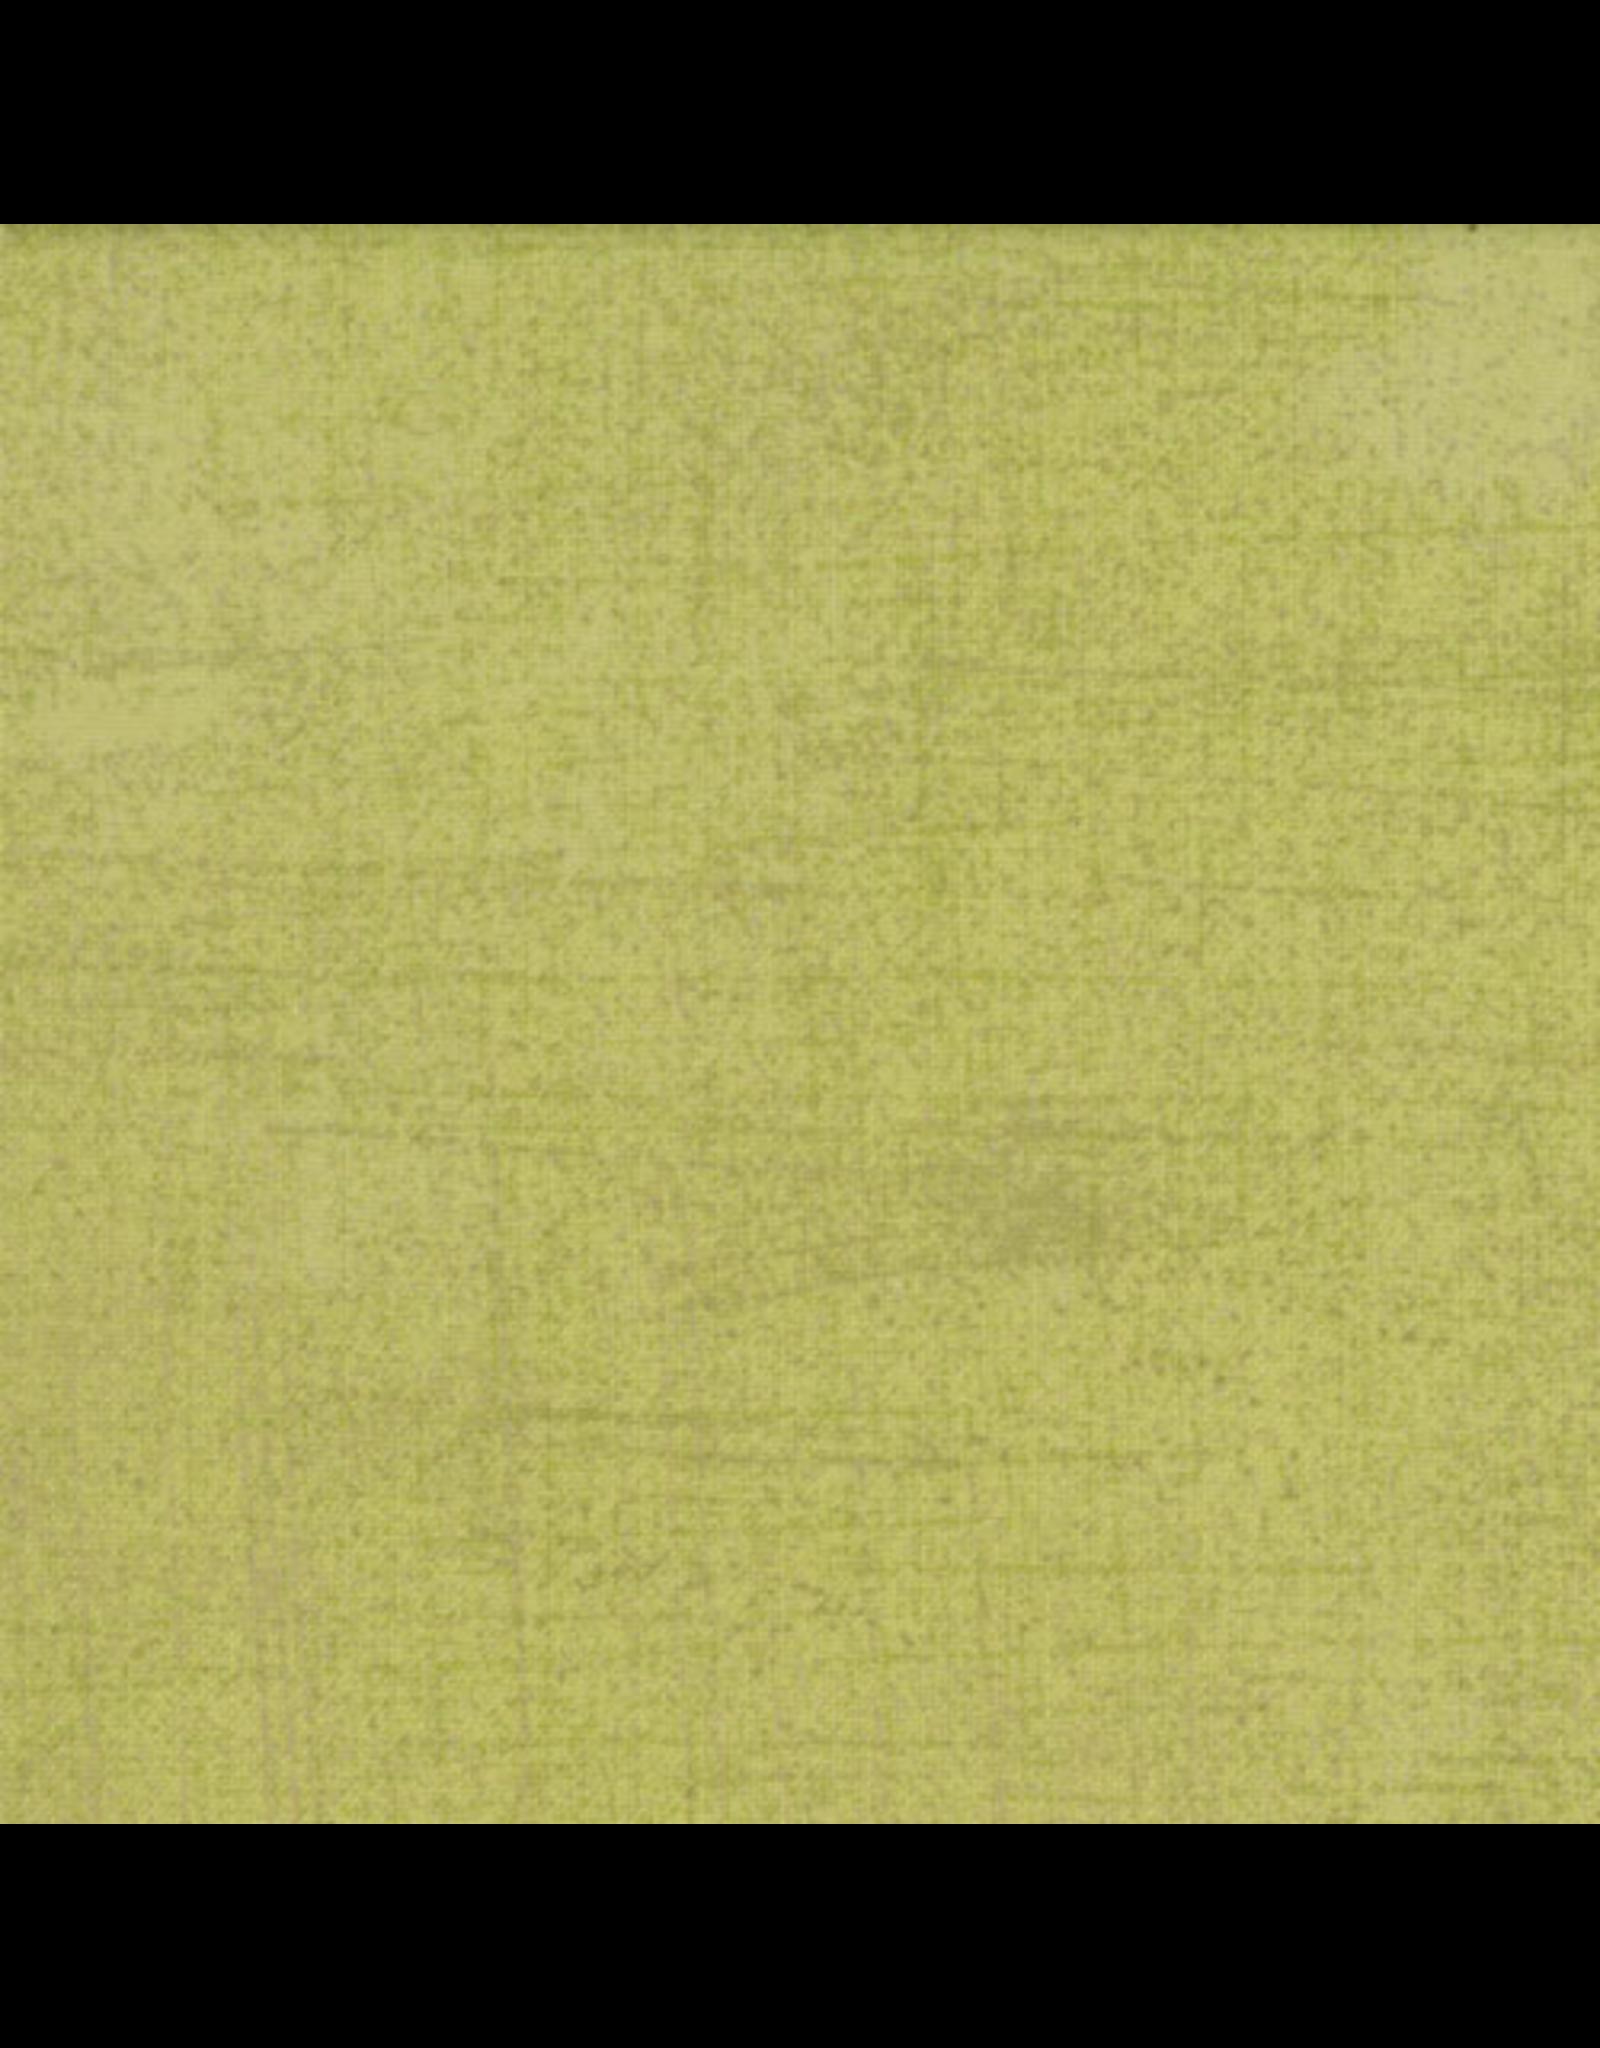 Moda Grunge in Kelp, Fabric Half-Yards 30150 97